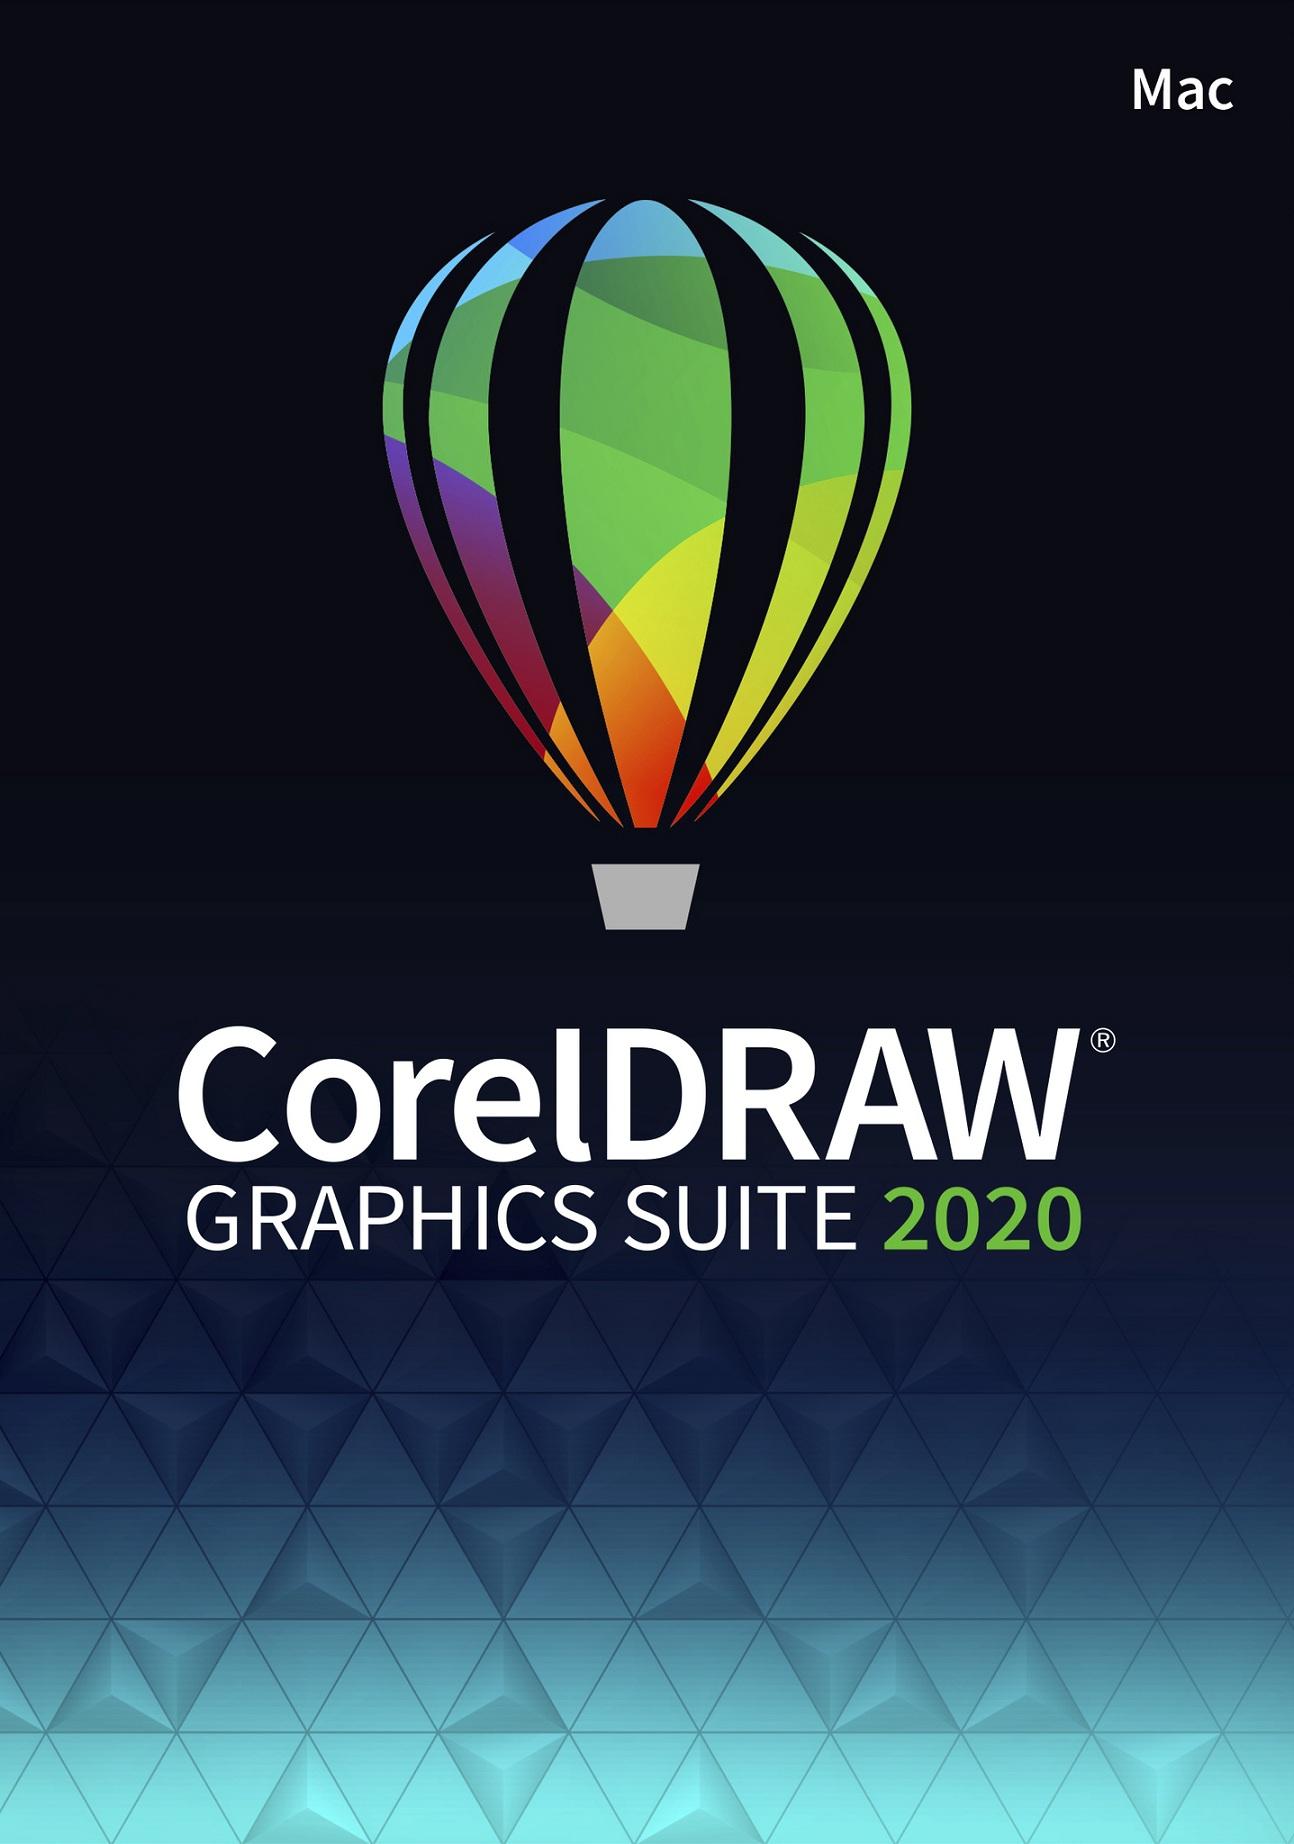 CorelDRAW Graphics Suite 2020 Education License (MAC) (5-50)